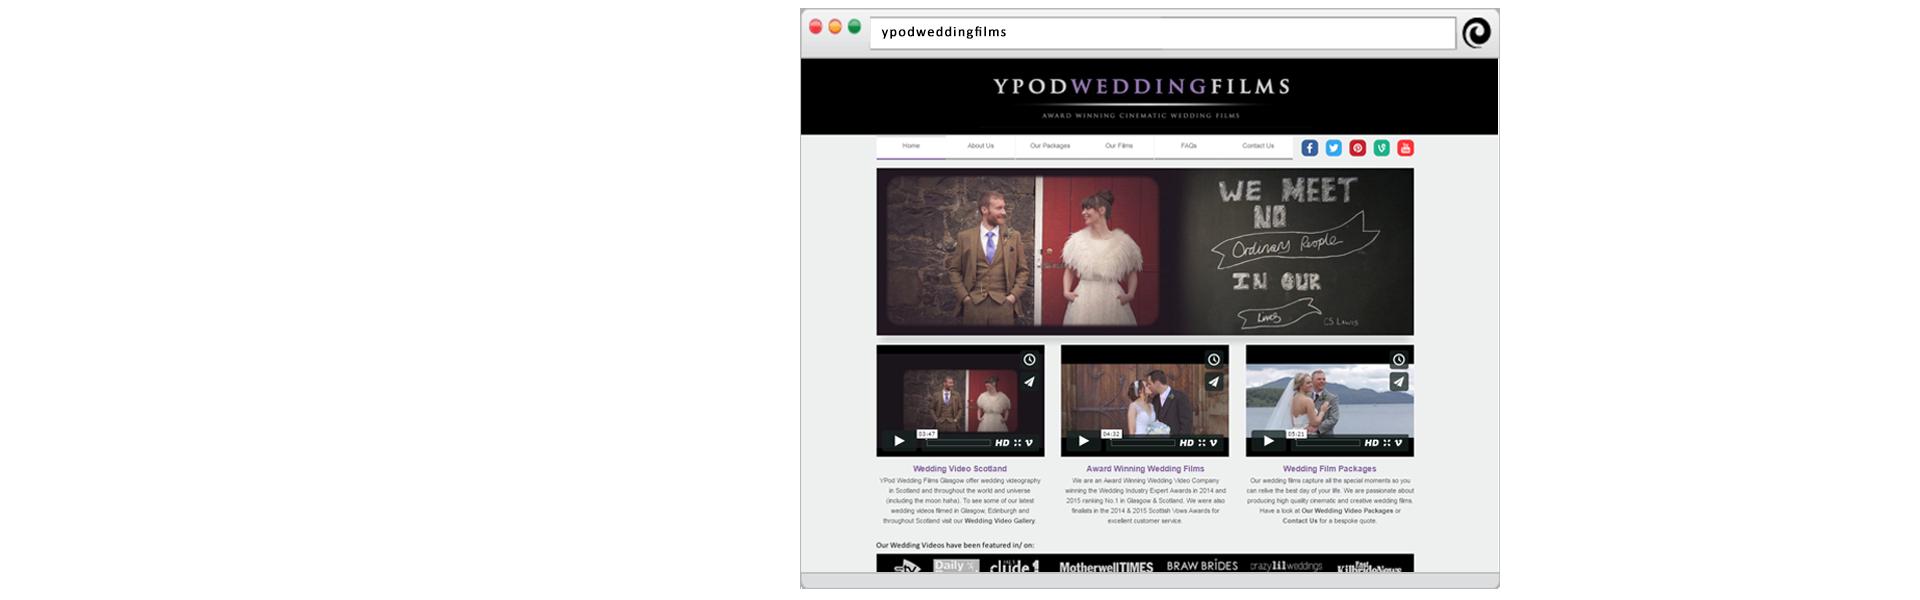 YPod Media Web Design Glasgow Scotland Slider - YPod Wedding Films